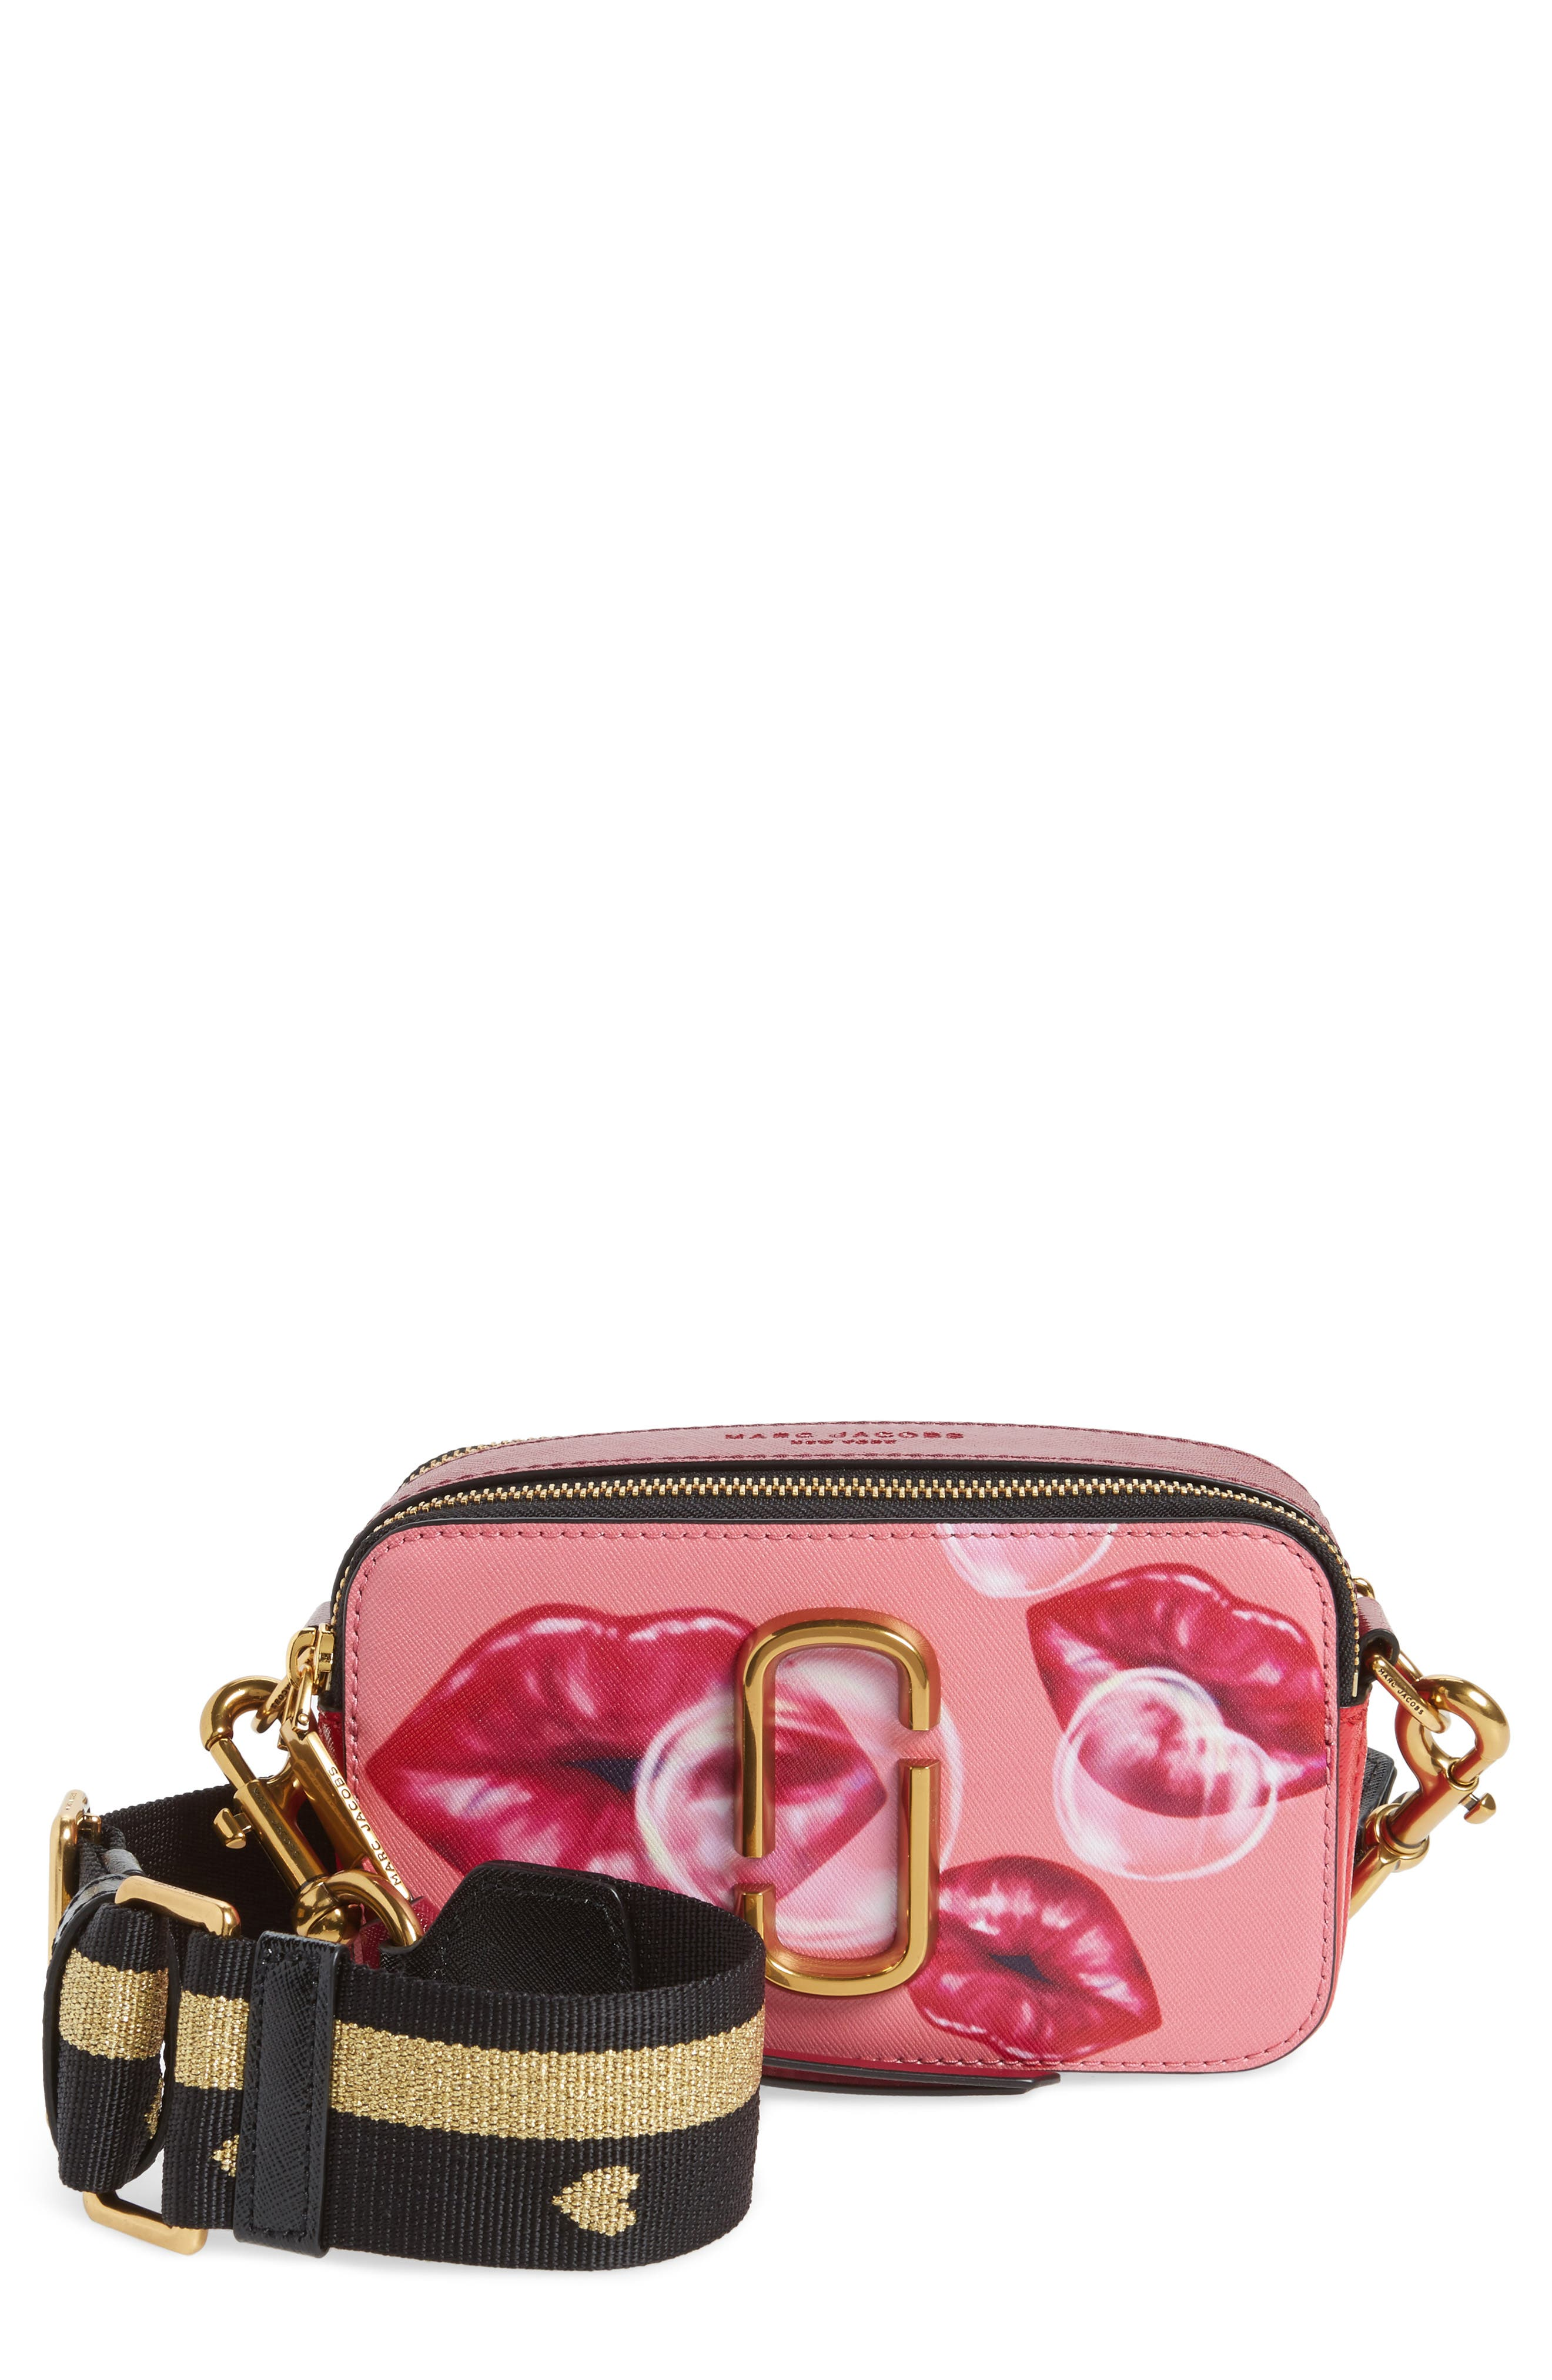 Snapshot Printed Lips Leather Crossbody Bag,                             Main thumbnail 1, color,                             675